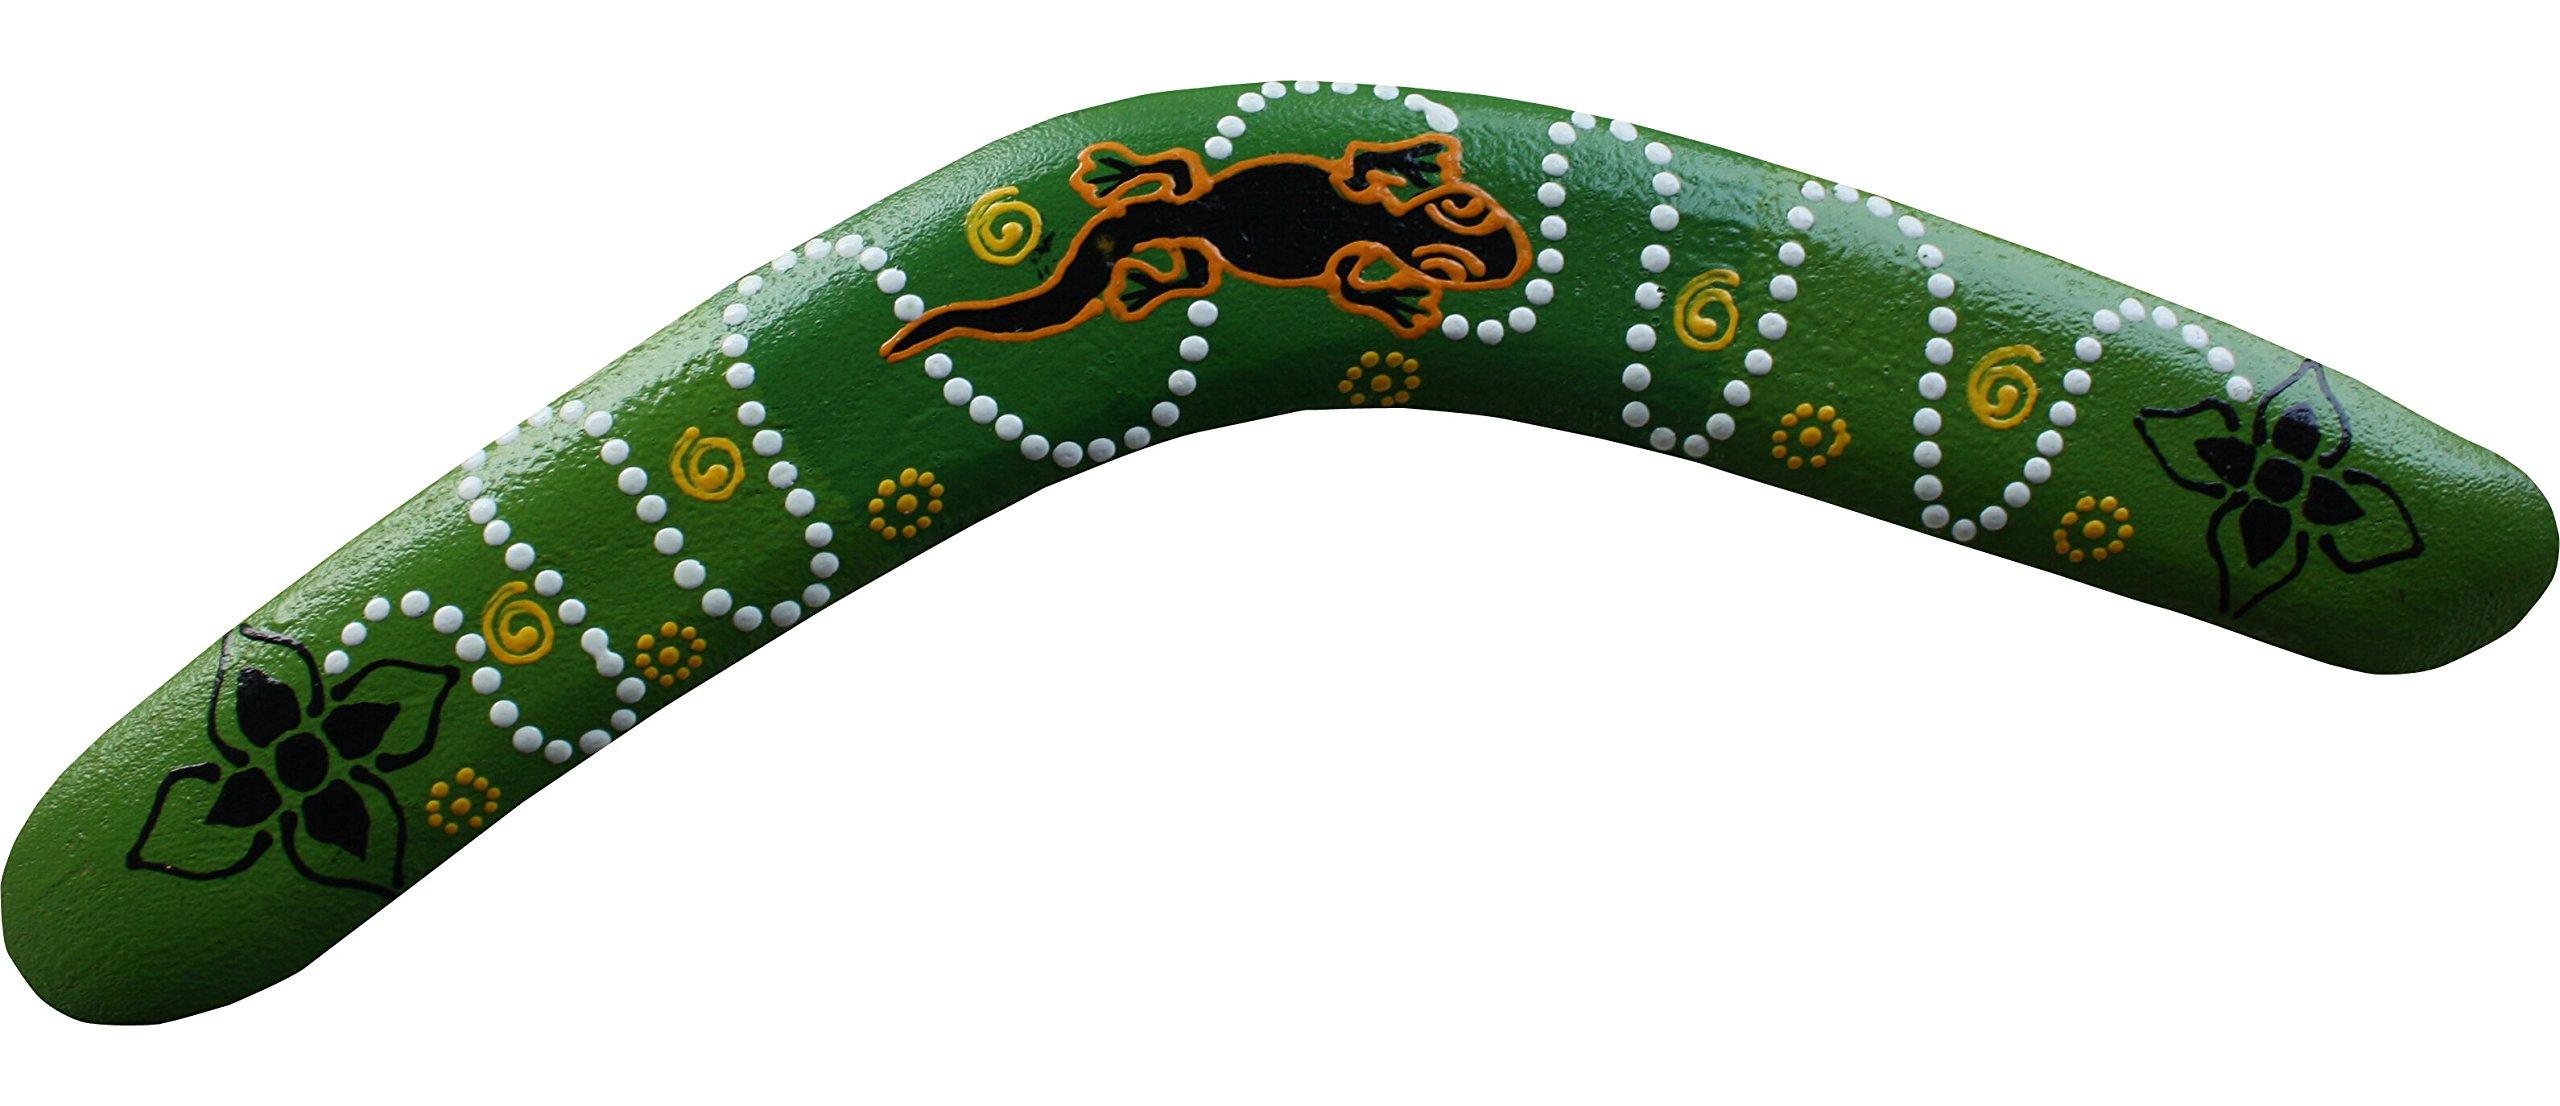 Raan Pah Muang Brand Thai Made Australian Aboriginal Art Decorative Boomerang #88304 by Raan Pah Muang (Image #1)